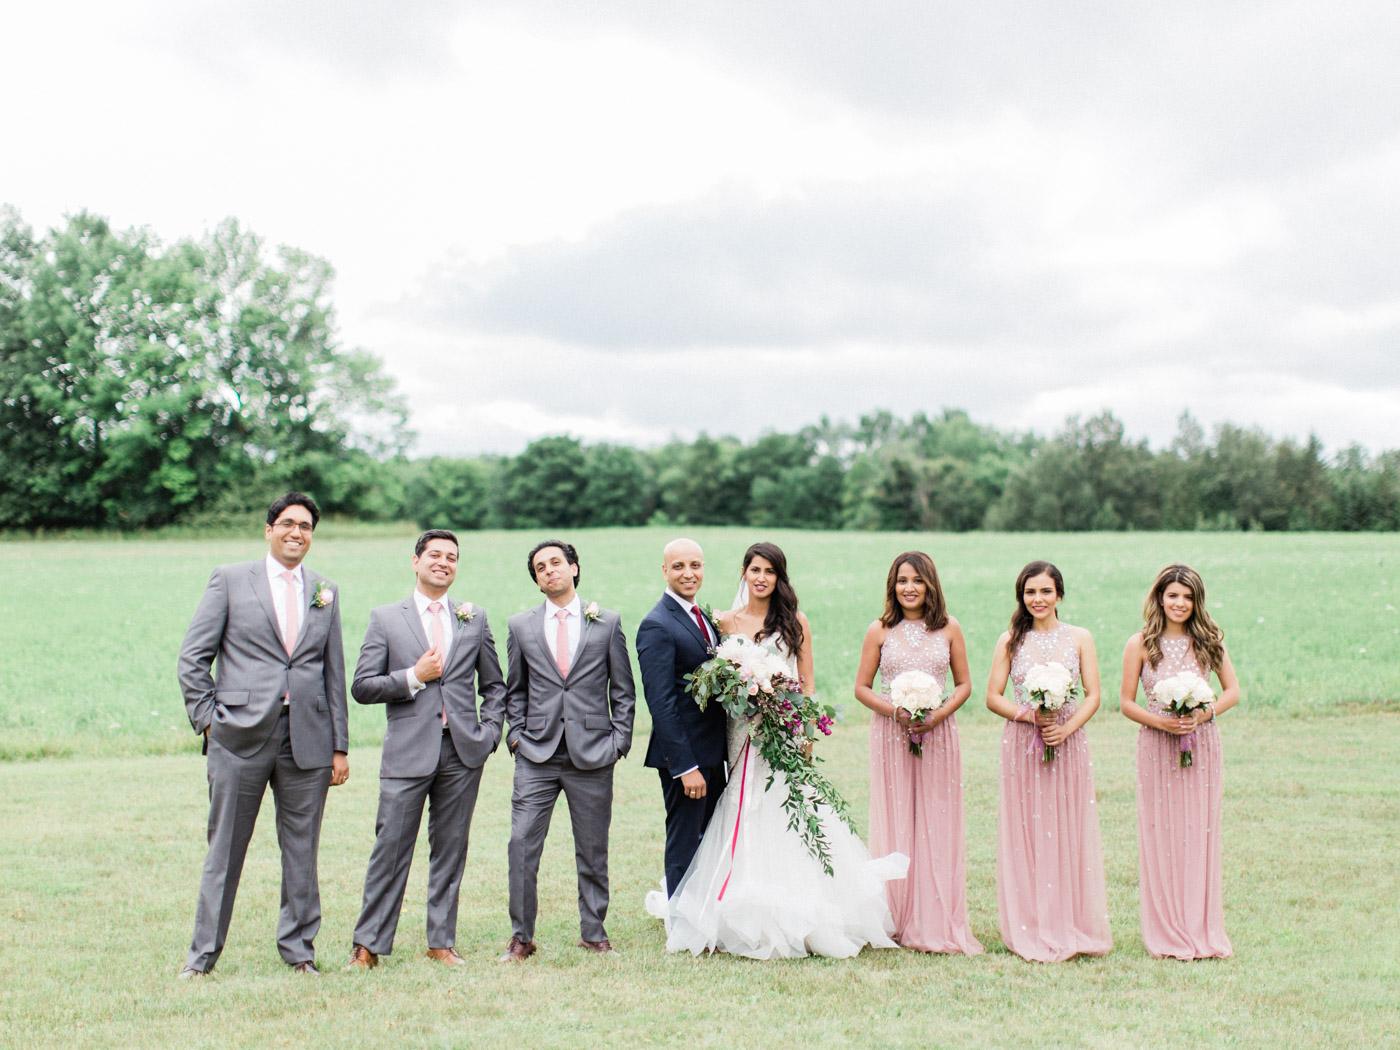 Toronto-Collingwood-wedding-photographer-indian-wedding-documentary65.jpg